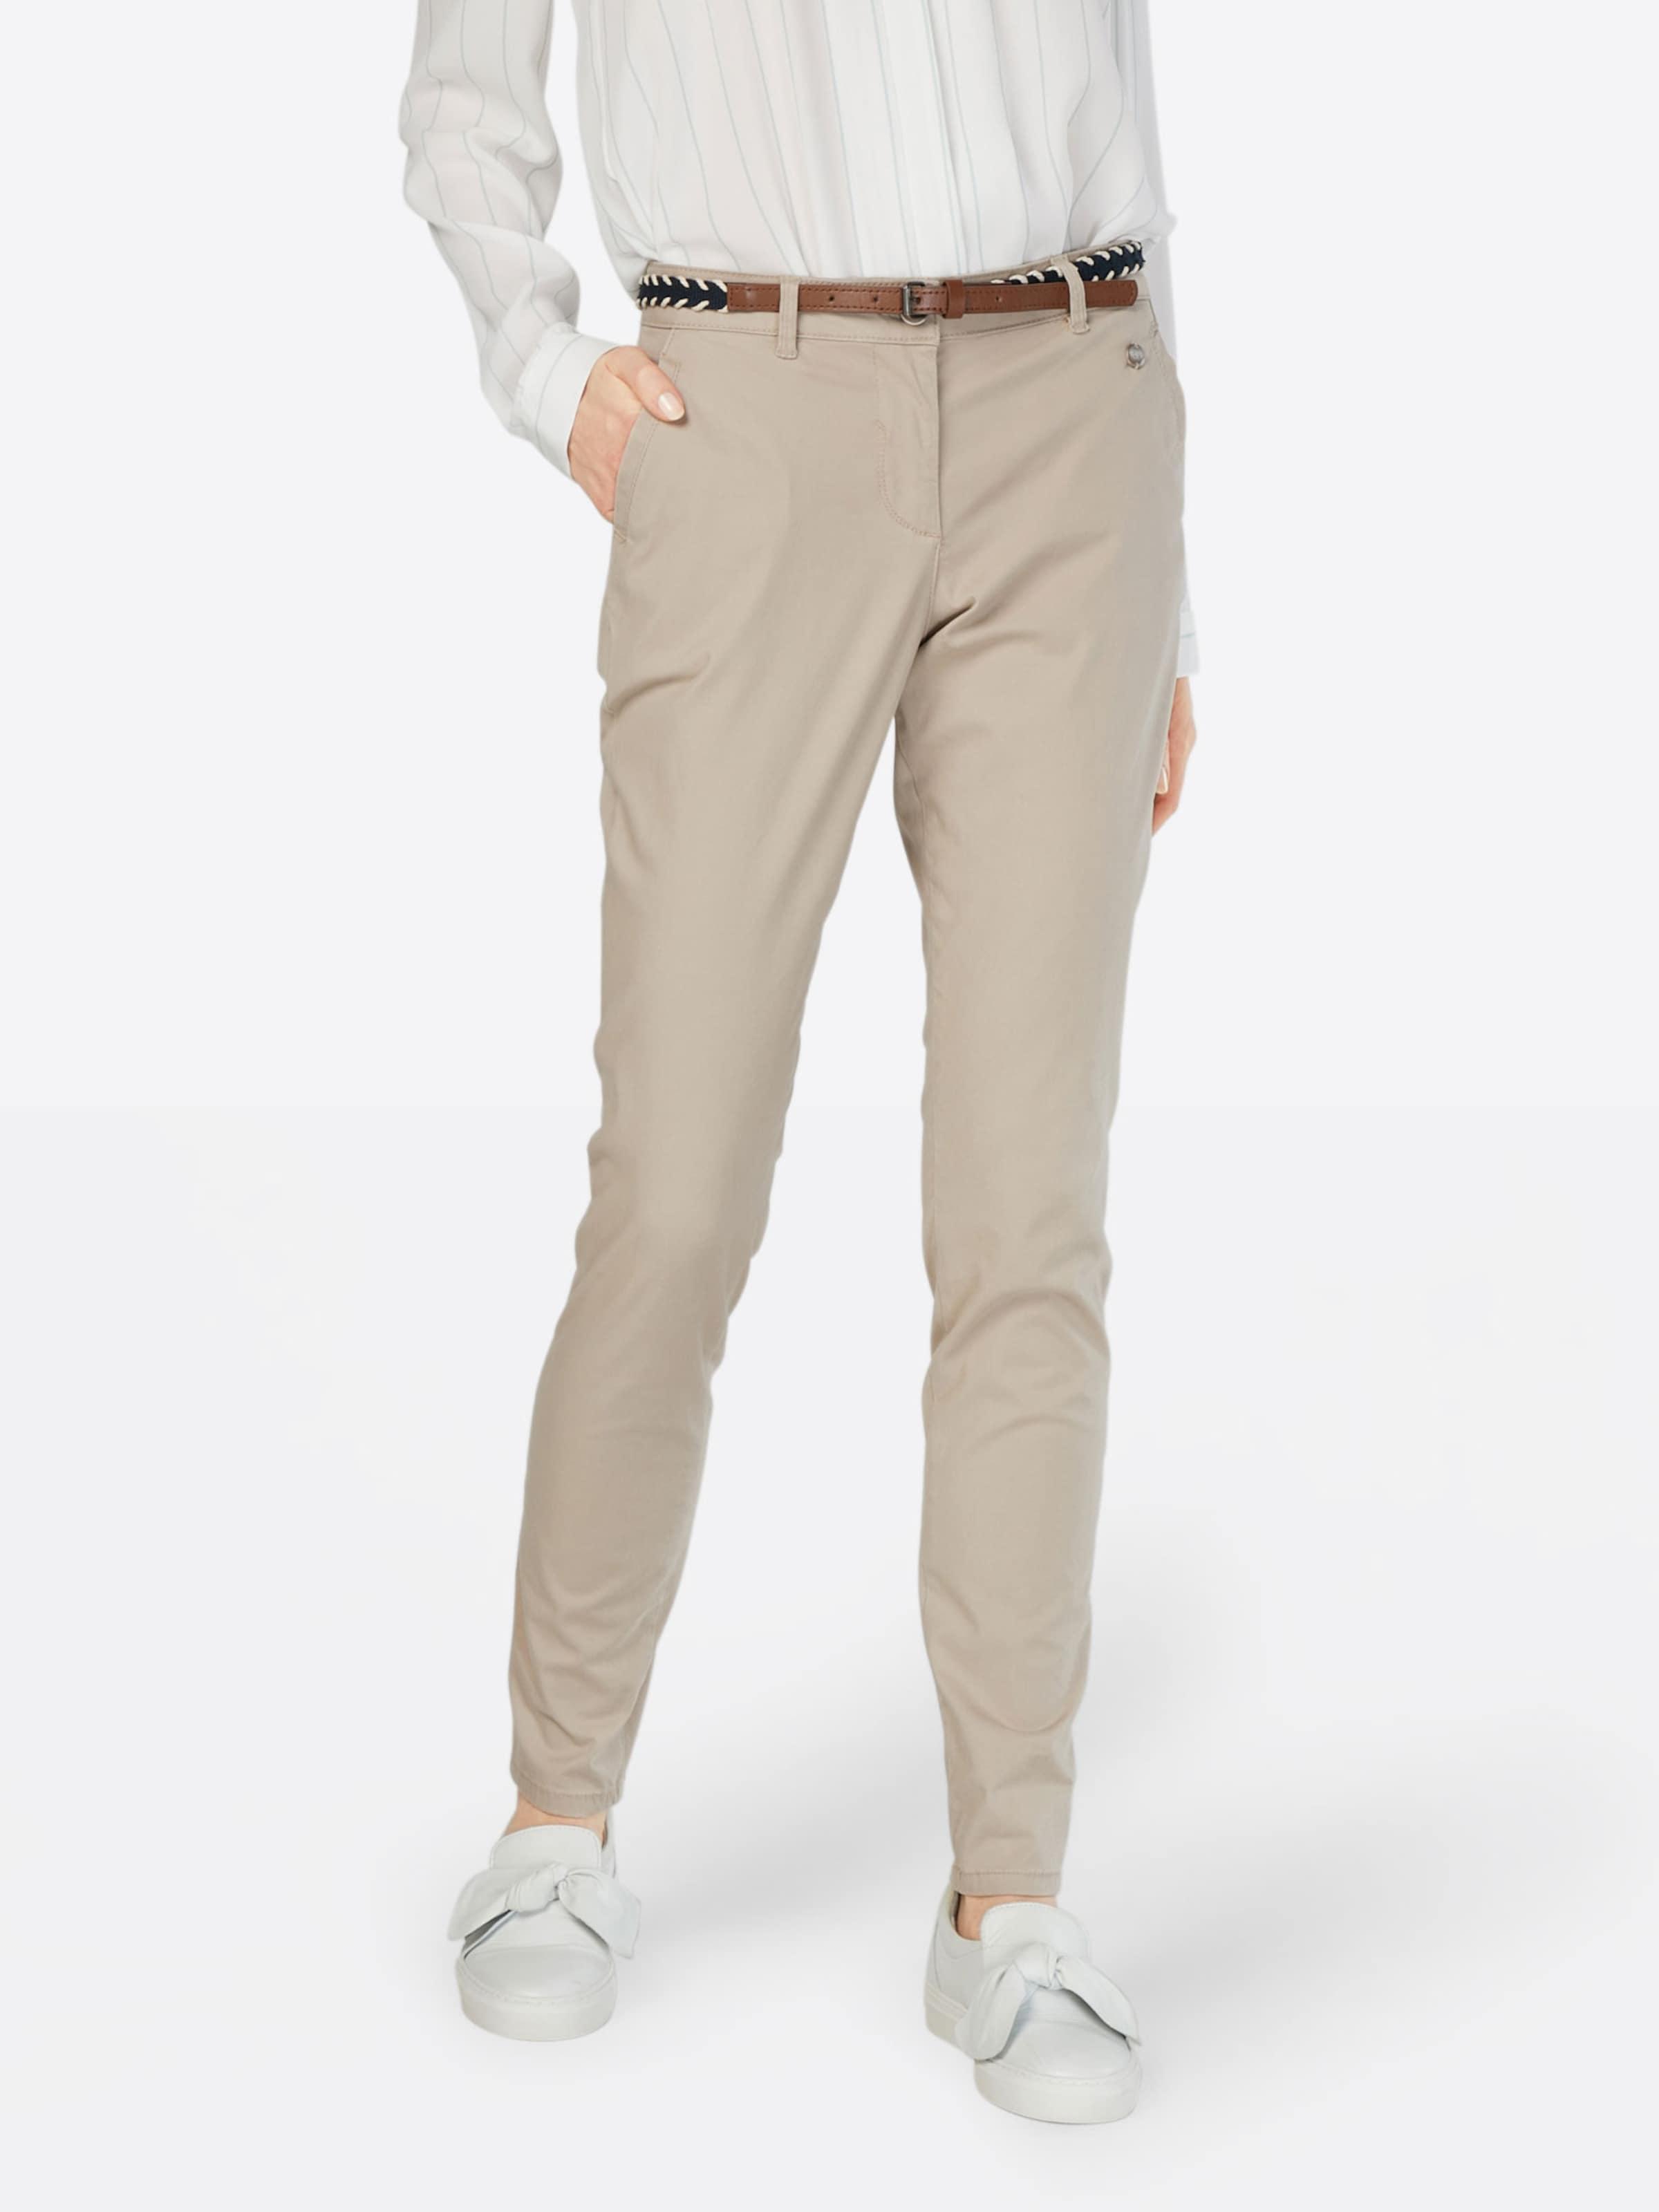 Pantalon Chino Clair Tailor Tom En Beige BdorxCeW